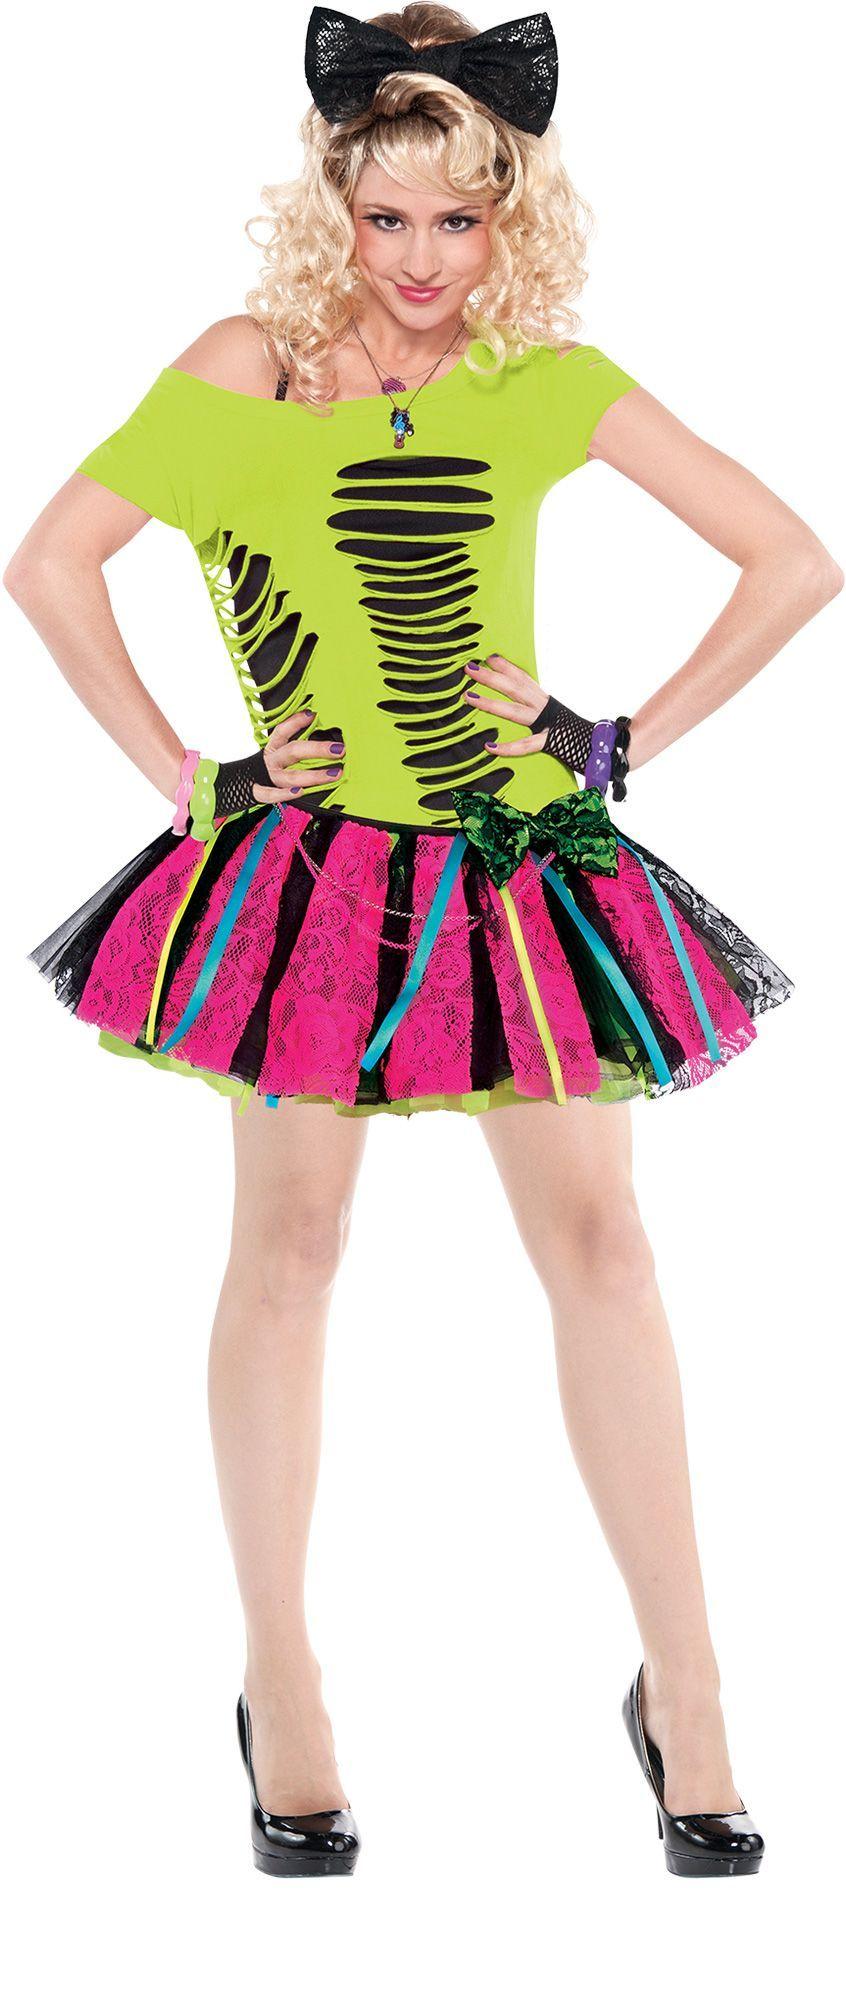 Make Your Costume 80s Womens Neon Tutu 1 Neon tutu